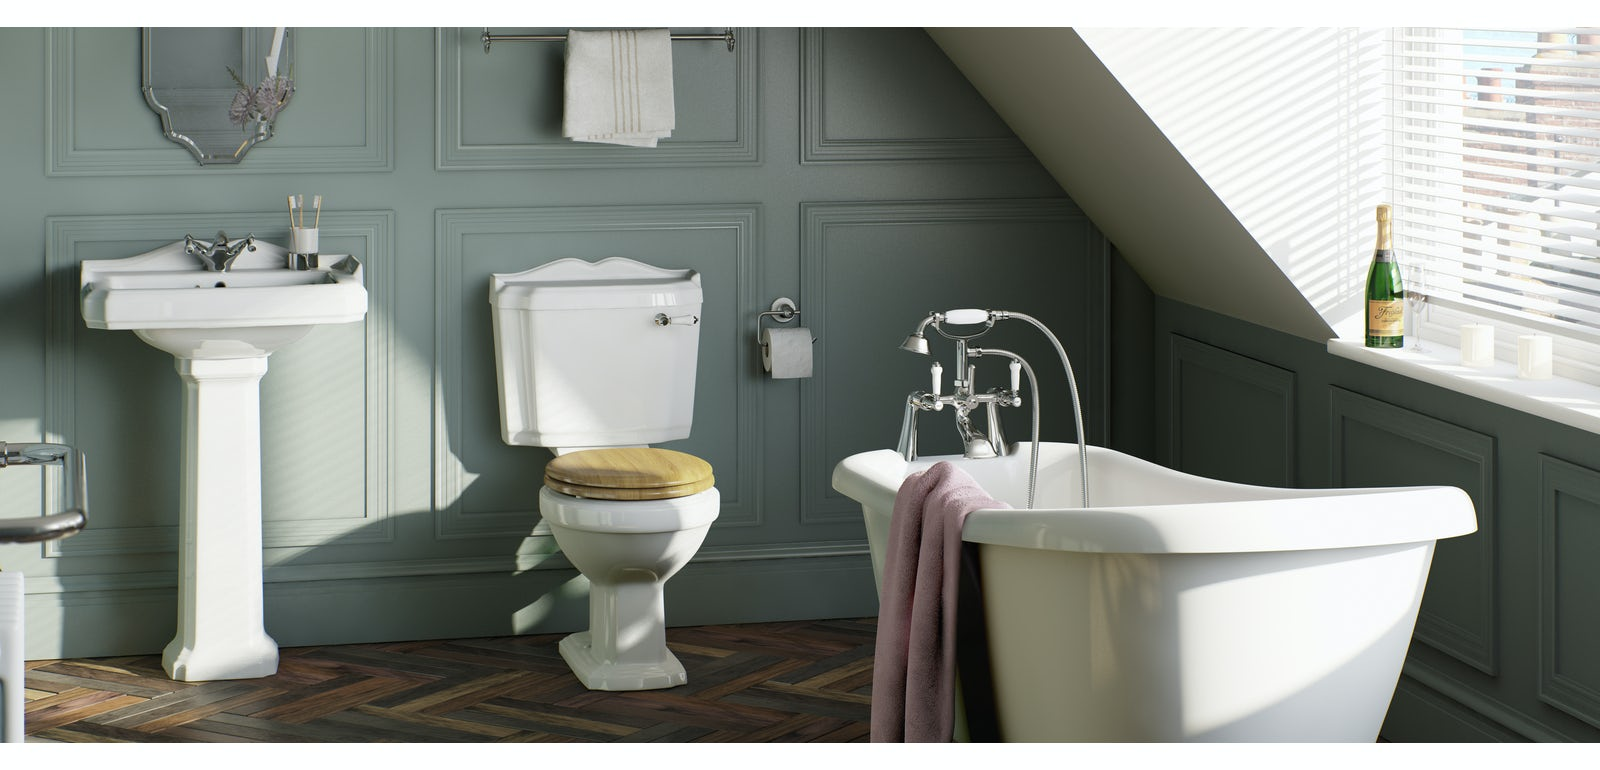 Period Bathroom Accessories Create A Victorian Style Bathroom Victoriaplumcom